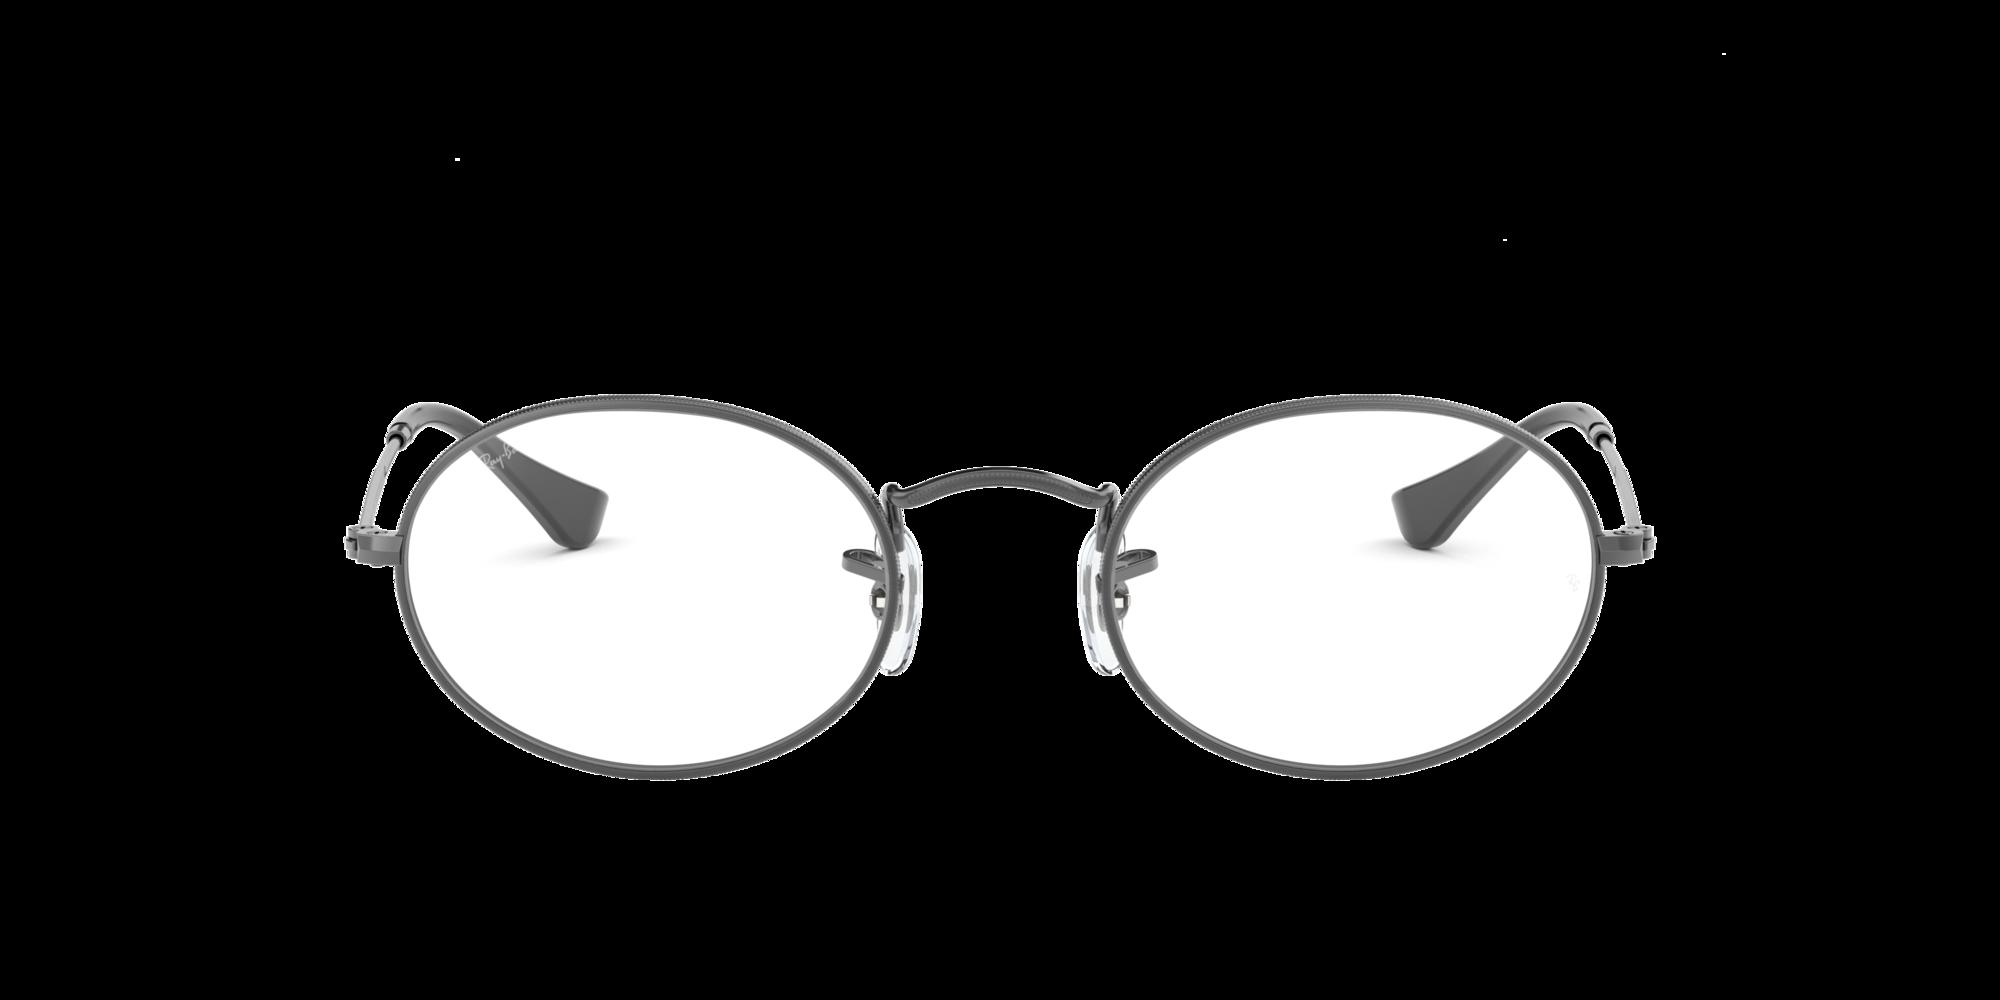 Image de RX3547V OVAL from LensCrafters | Lunettes, lunettes d'ordonnance en ligne, lunetterie